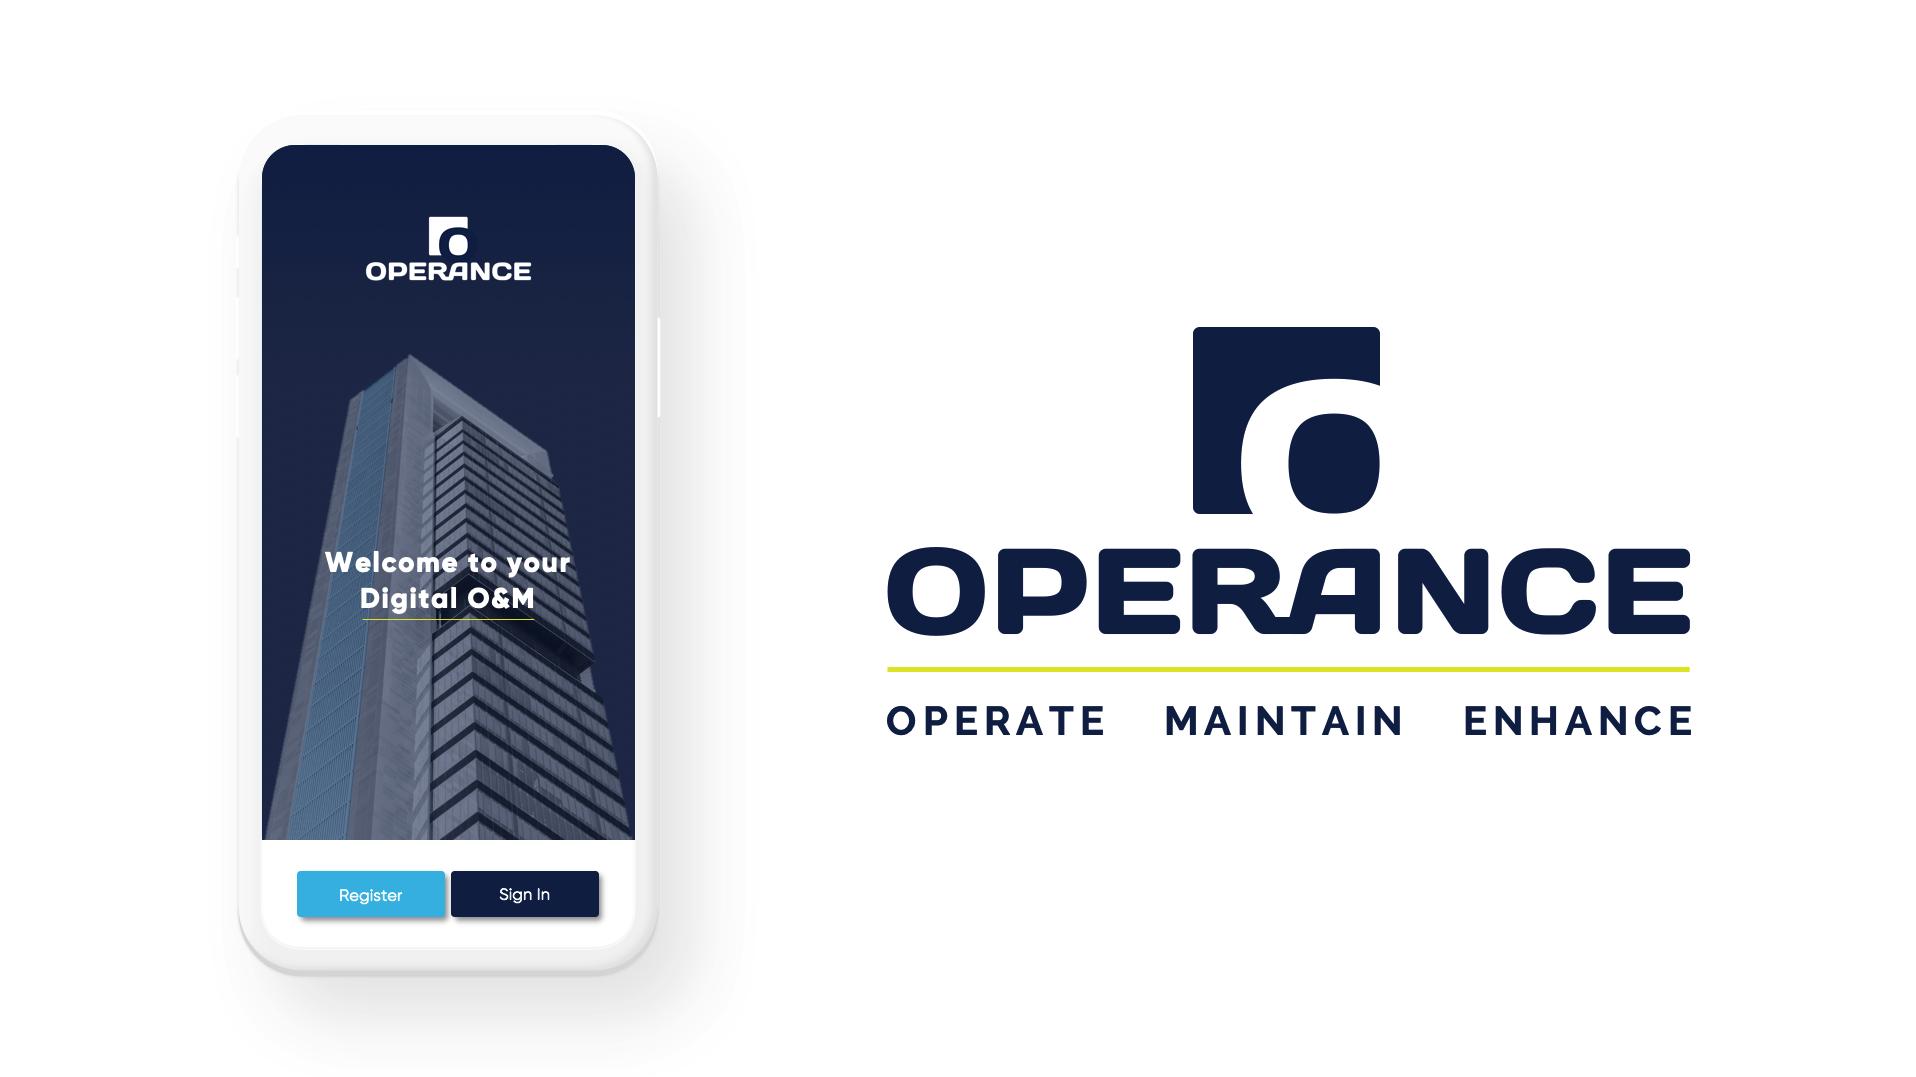 Operance - Digital O&M by Bimsense.